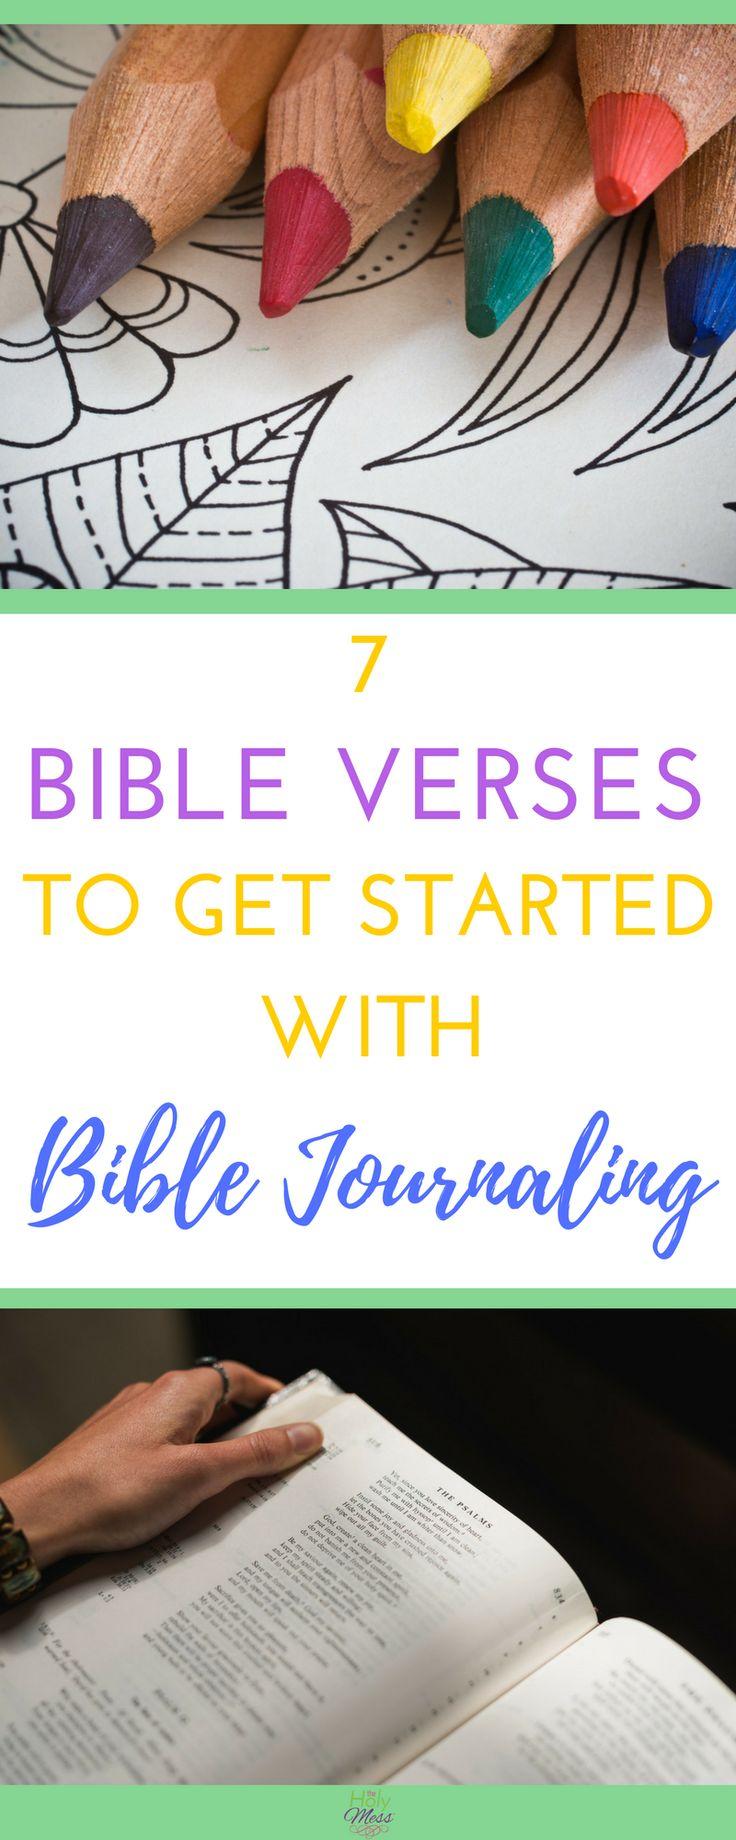 17 Best Ideas About Bible Journal On Pinterest